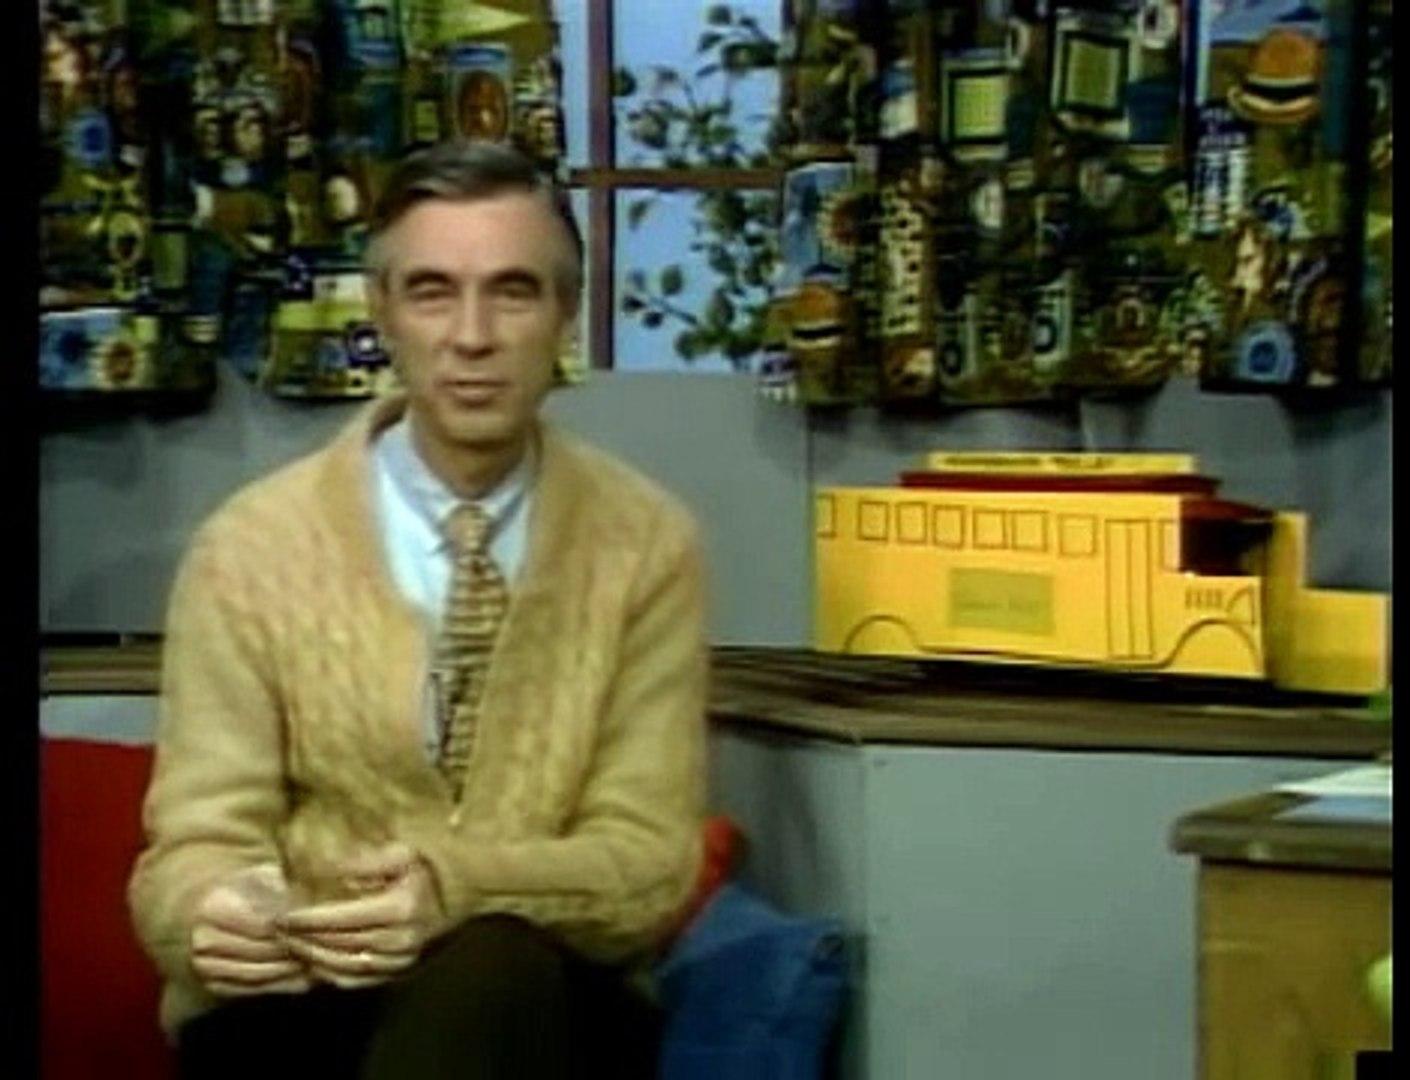 Mister Rogers Goes to School - Mister Rogers' Neighborhood